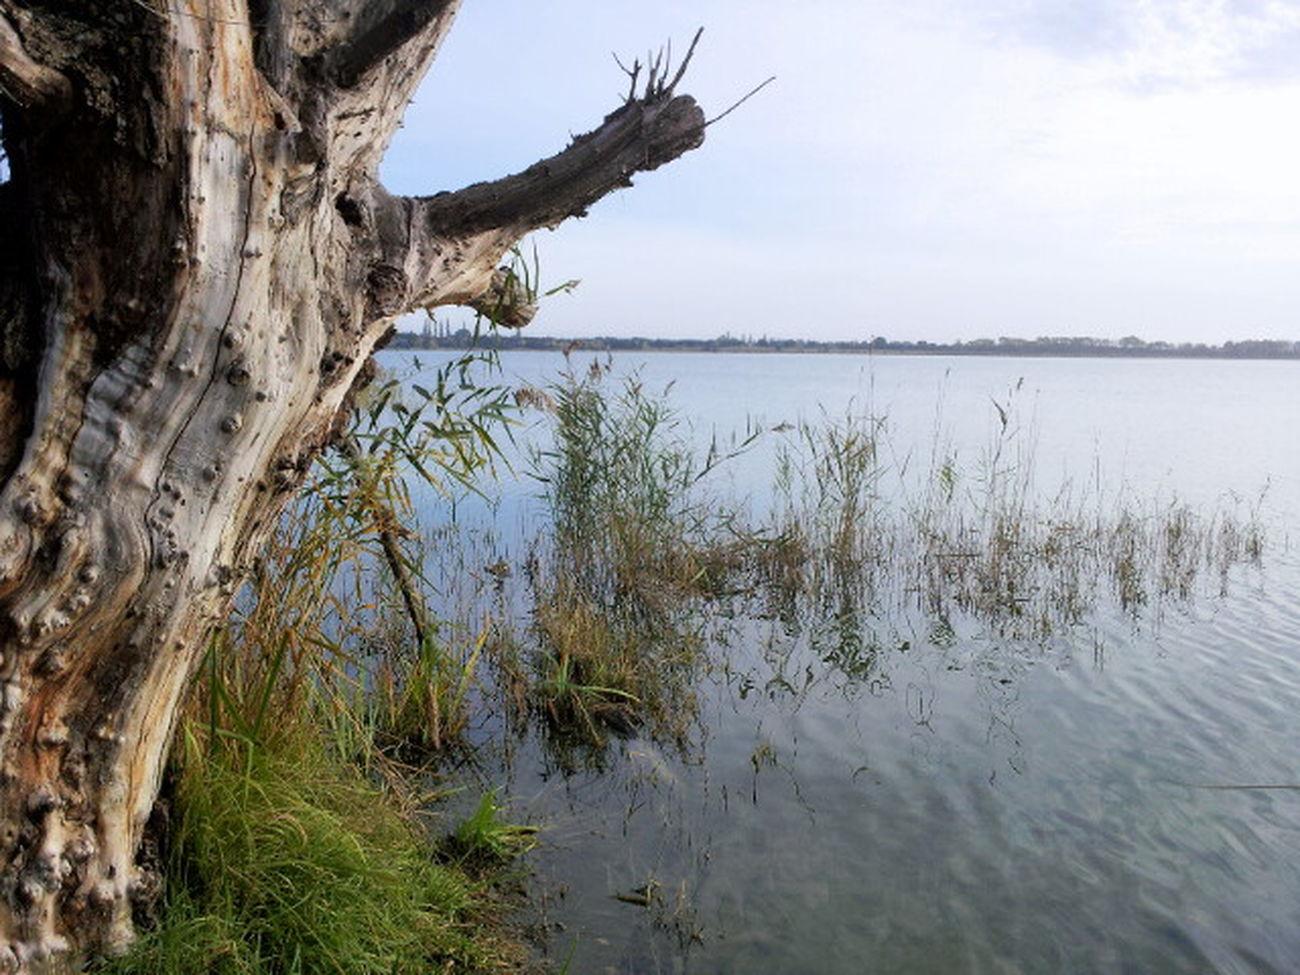 Etang des aulnes EyeEm Best Shots EyeEm Best Edits Landscape Naturelovers